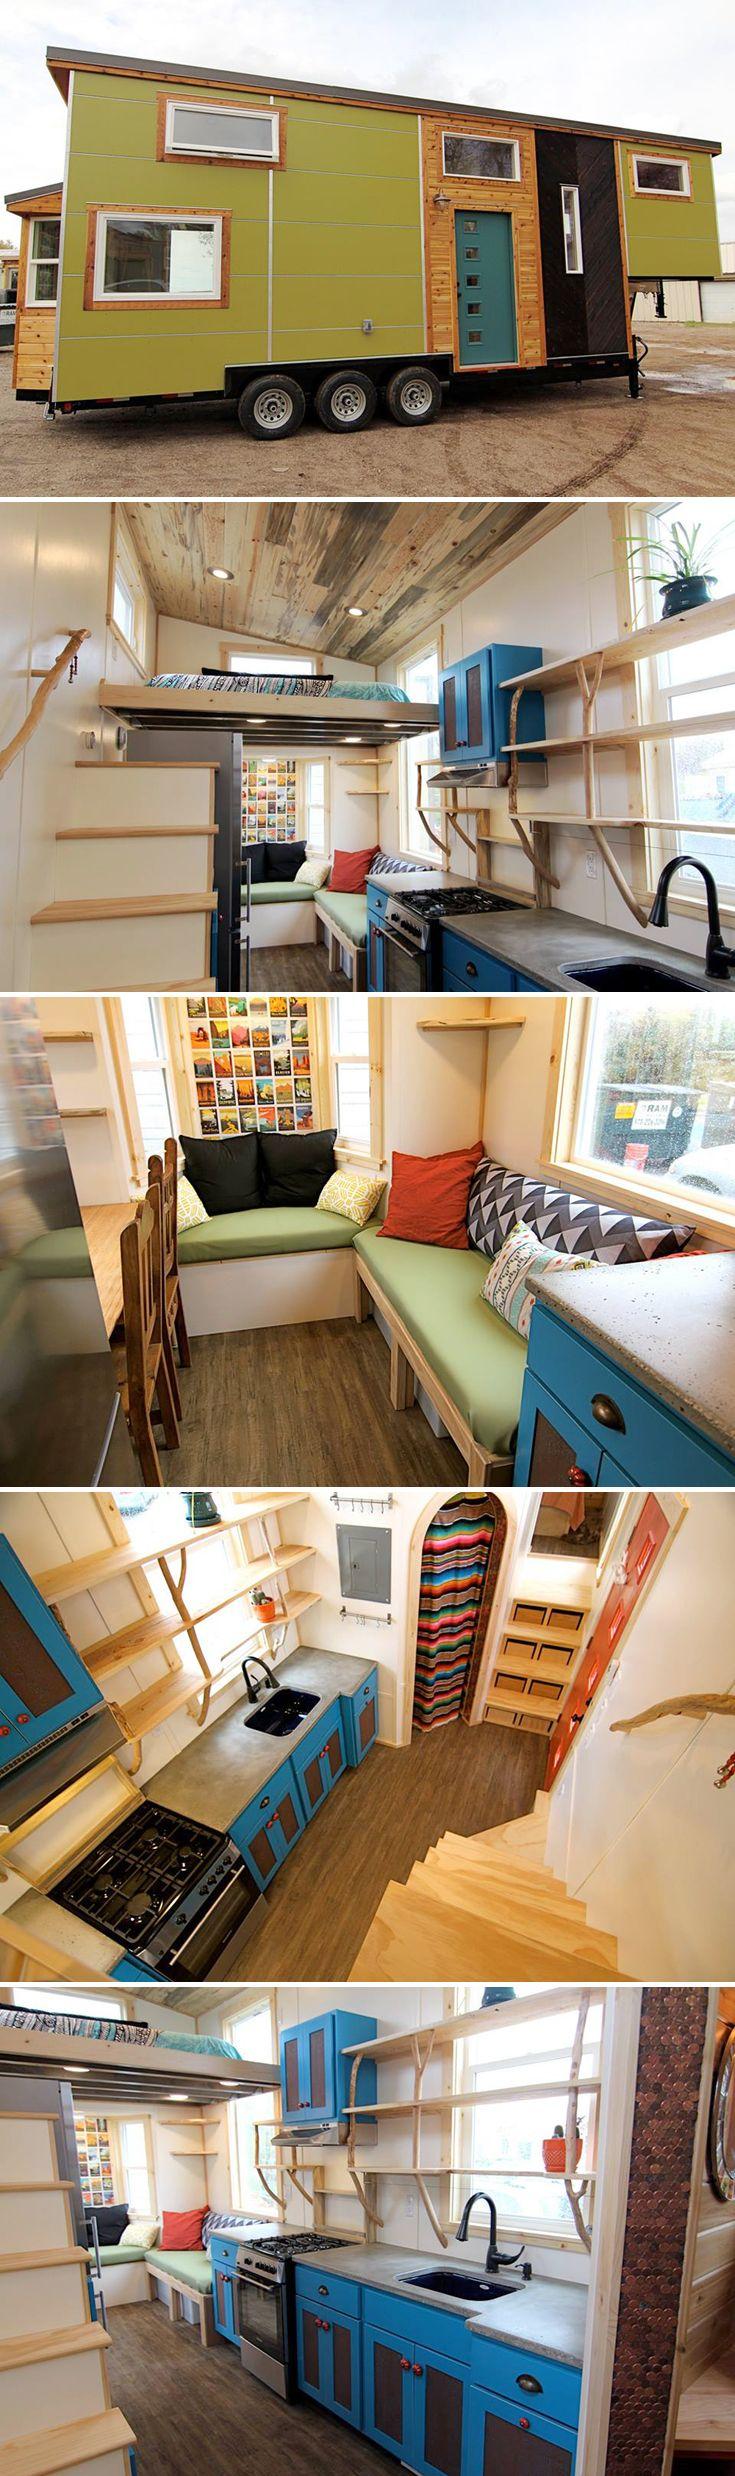 best 25 portable house ideas on pinterest prefab stairs muji